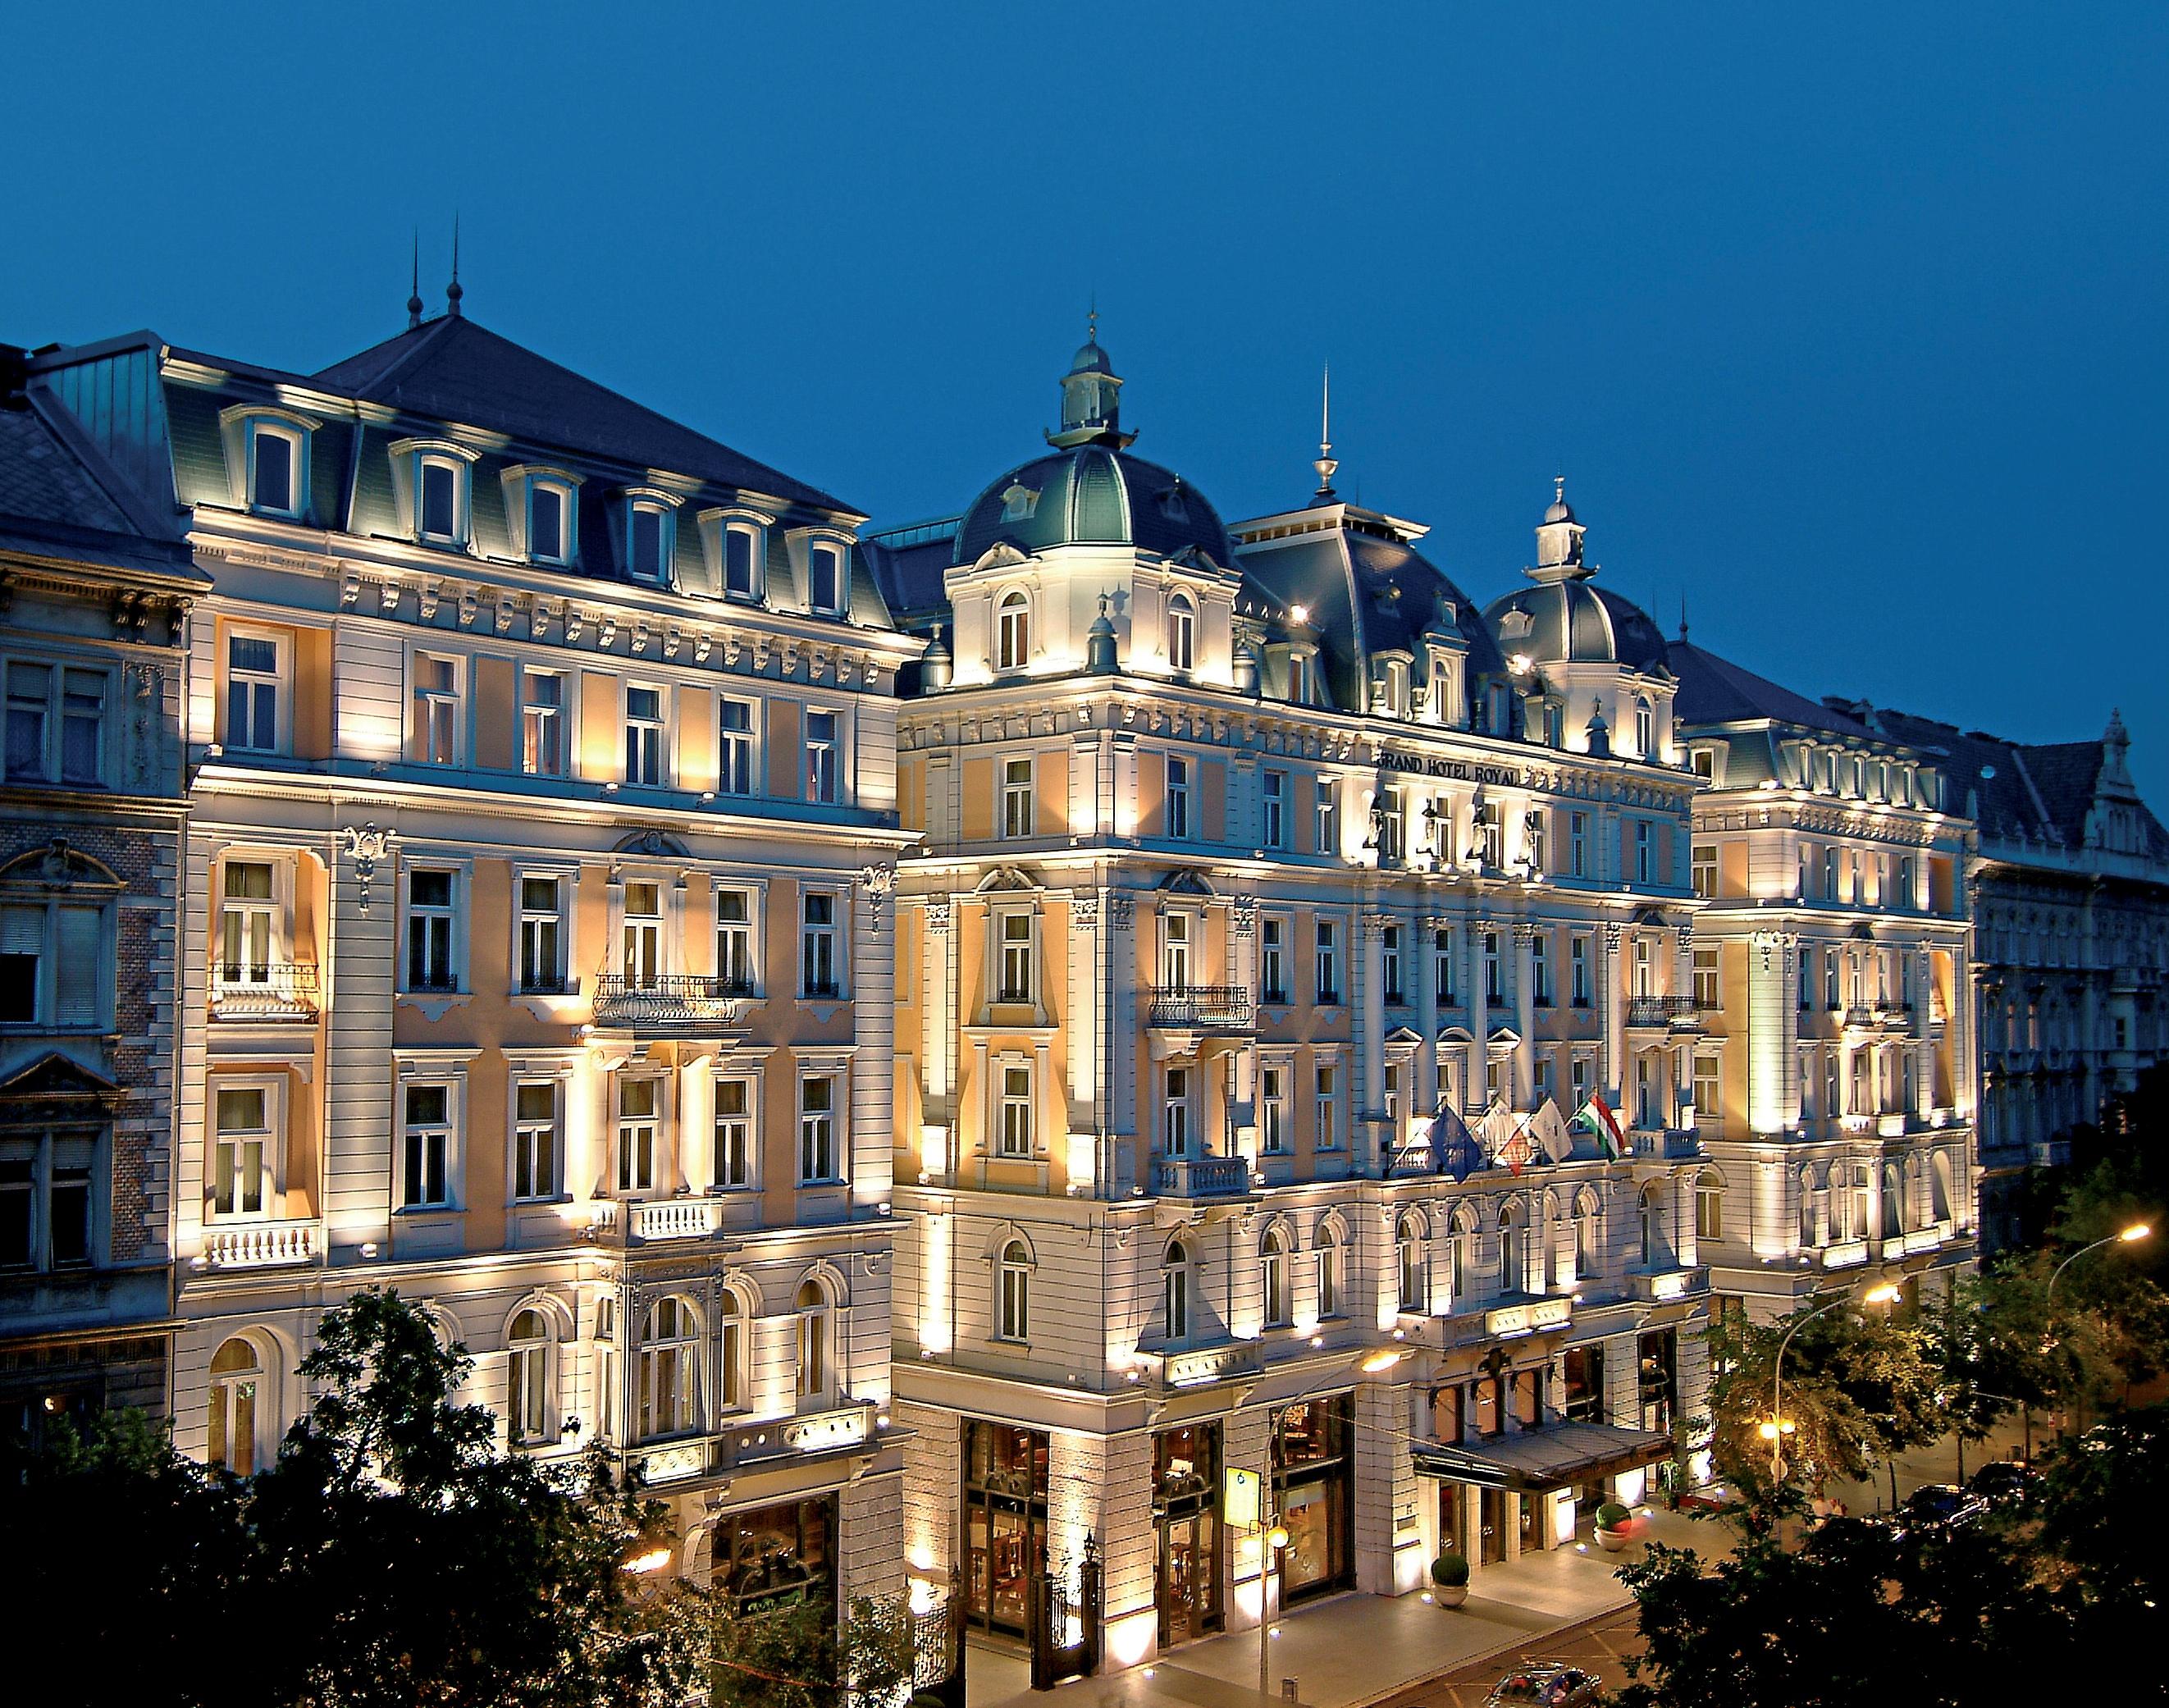 Corinthia Hotel Budapest Facade